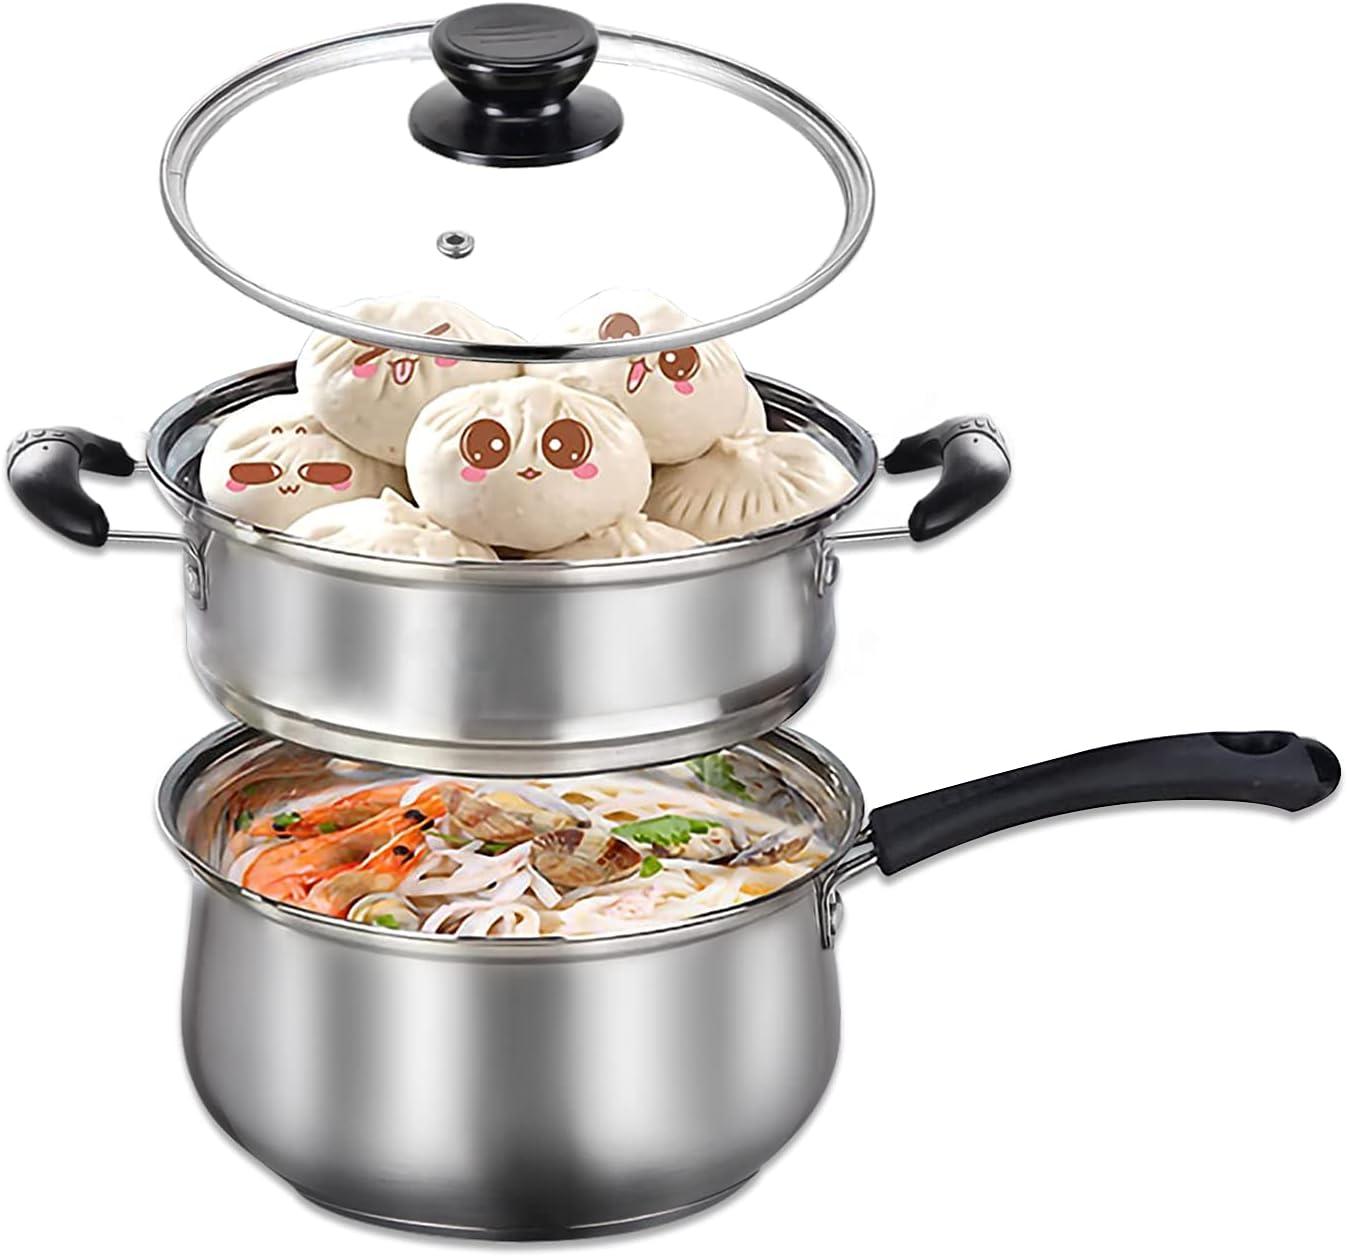 MANO 2 Quart Saucepan With Steamer Insert and Lid Stainless Steel Sauce Pan with Steamer Rack Nonstick Milk Pot Butter Warmer Melting Cooking Pot Heatproof Handle Multipurpose Cookware